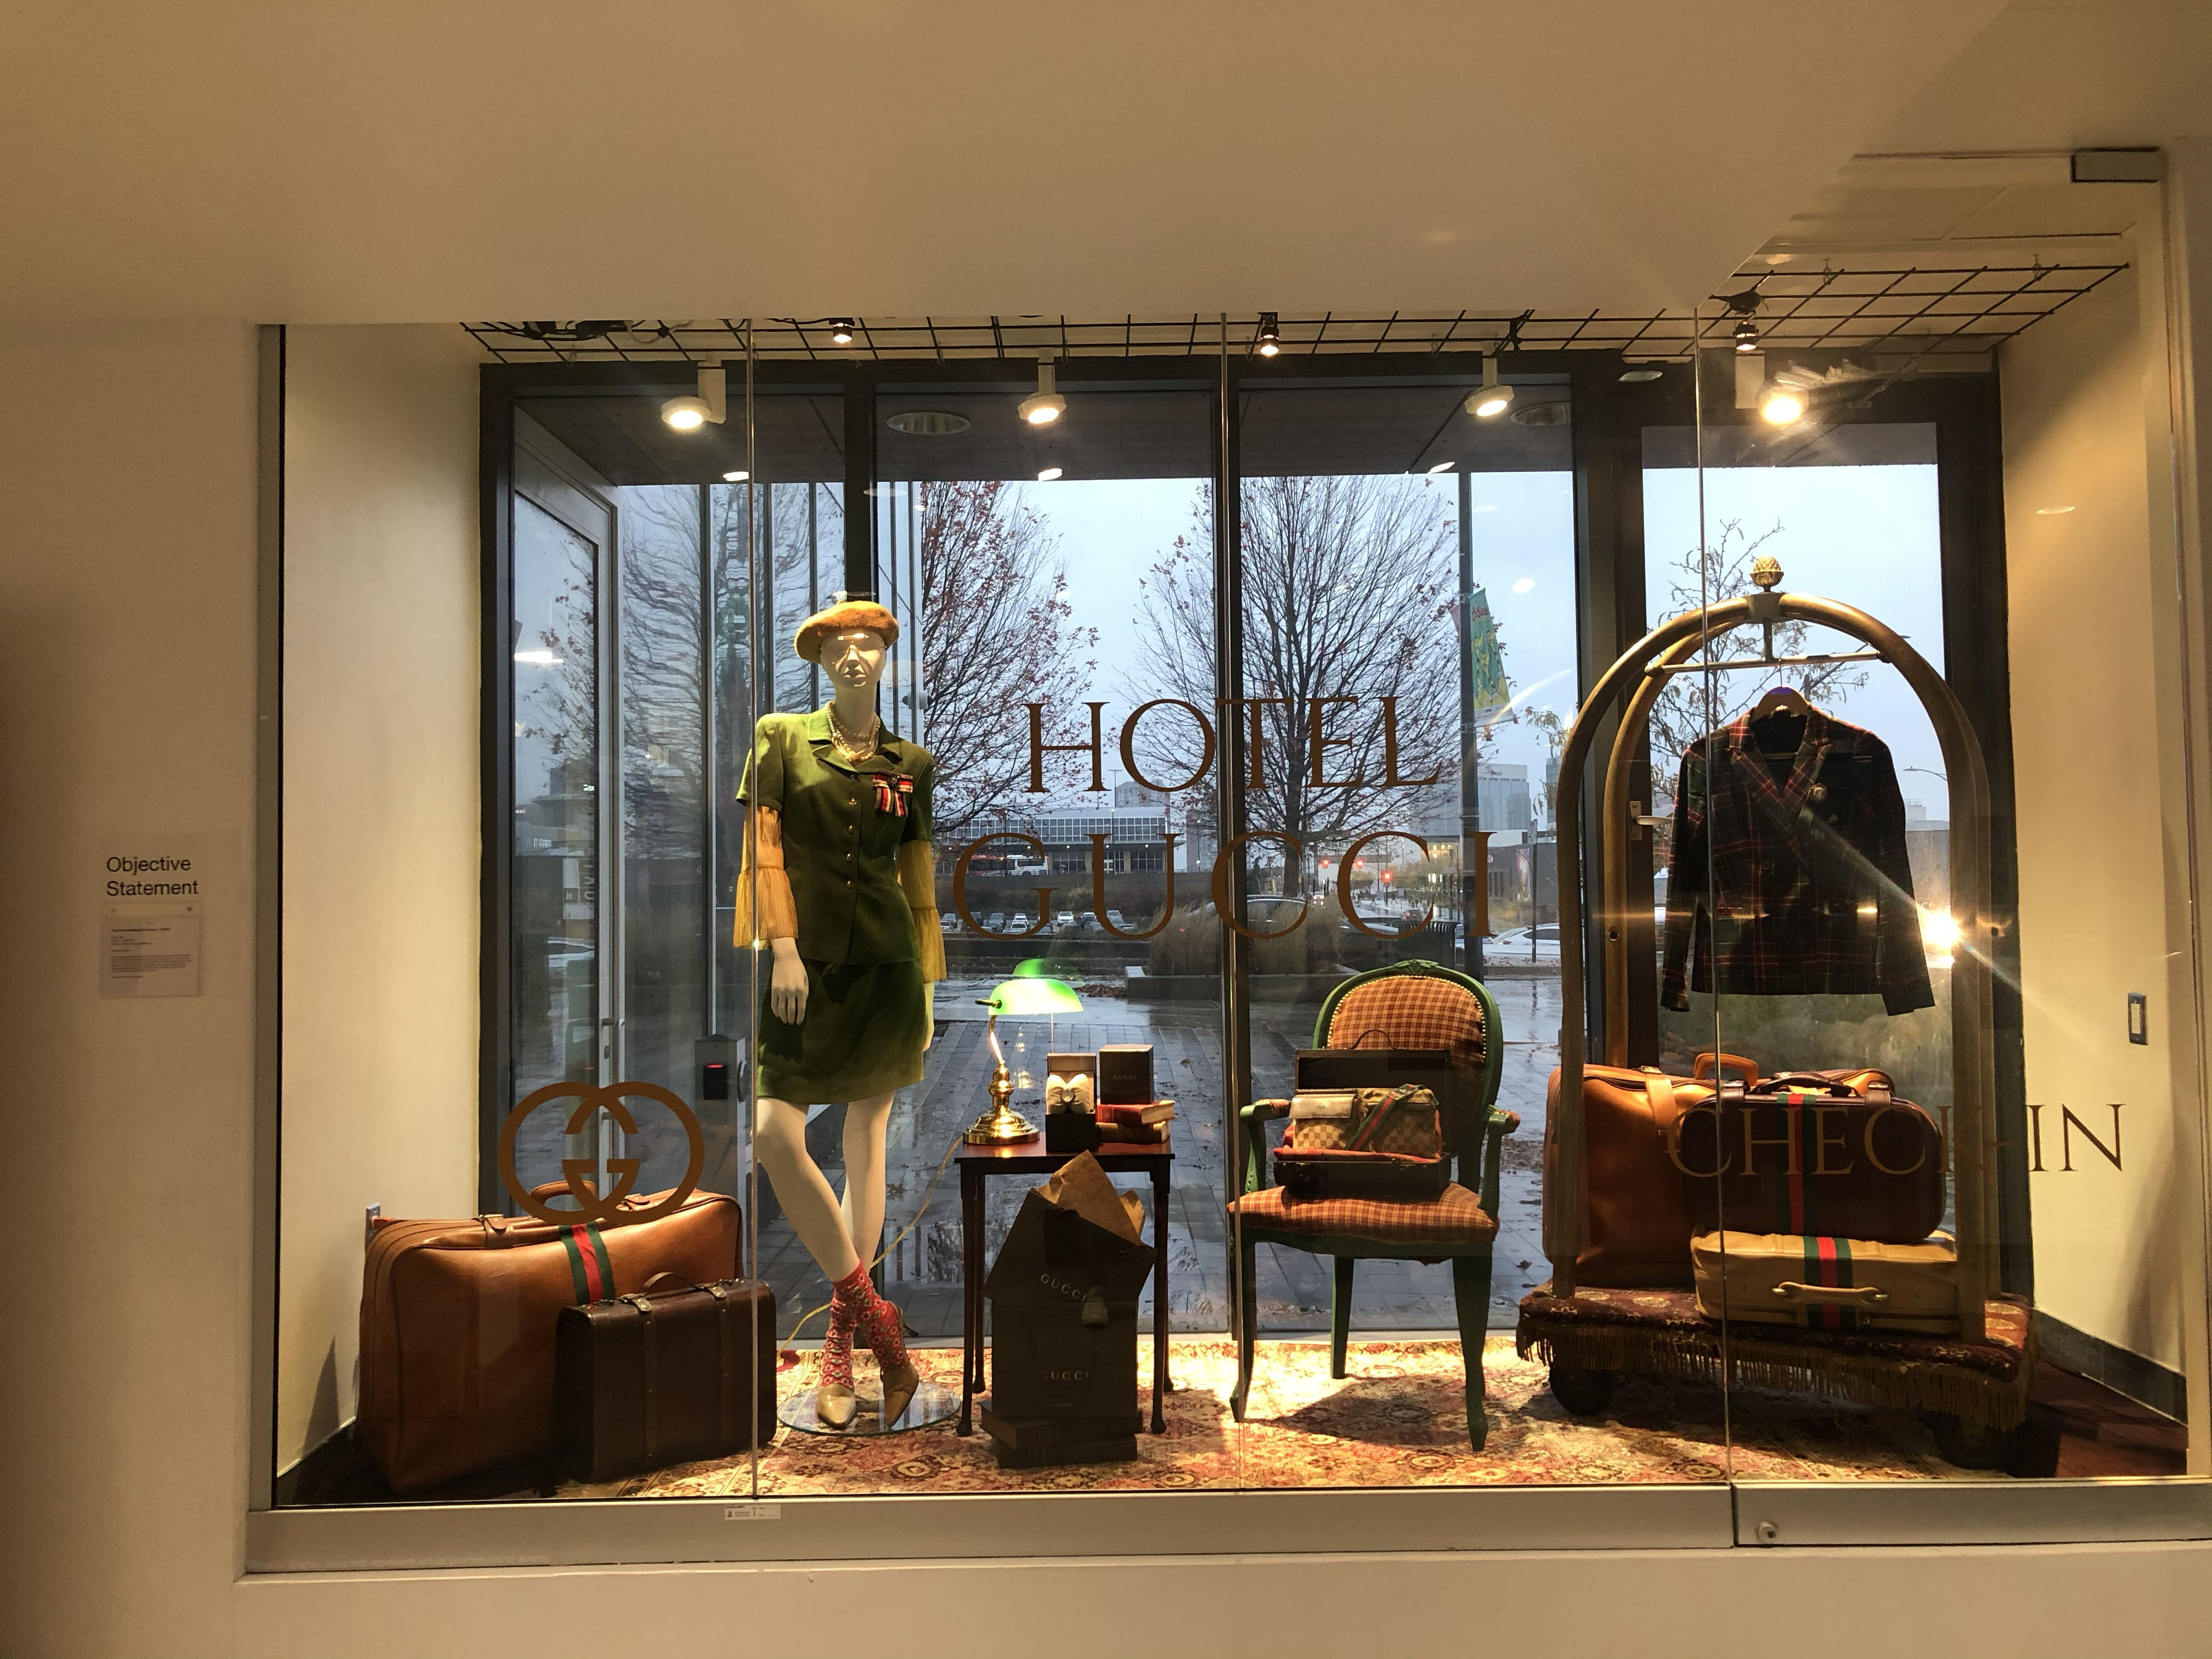 Hotel Gucci | Sheridan College<br/><i>K. Ha, Kendra Hartholt, J. Johnson & S. Intzempelis</i>